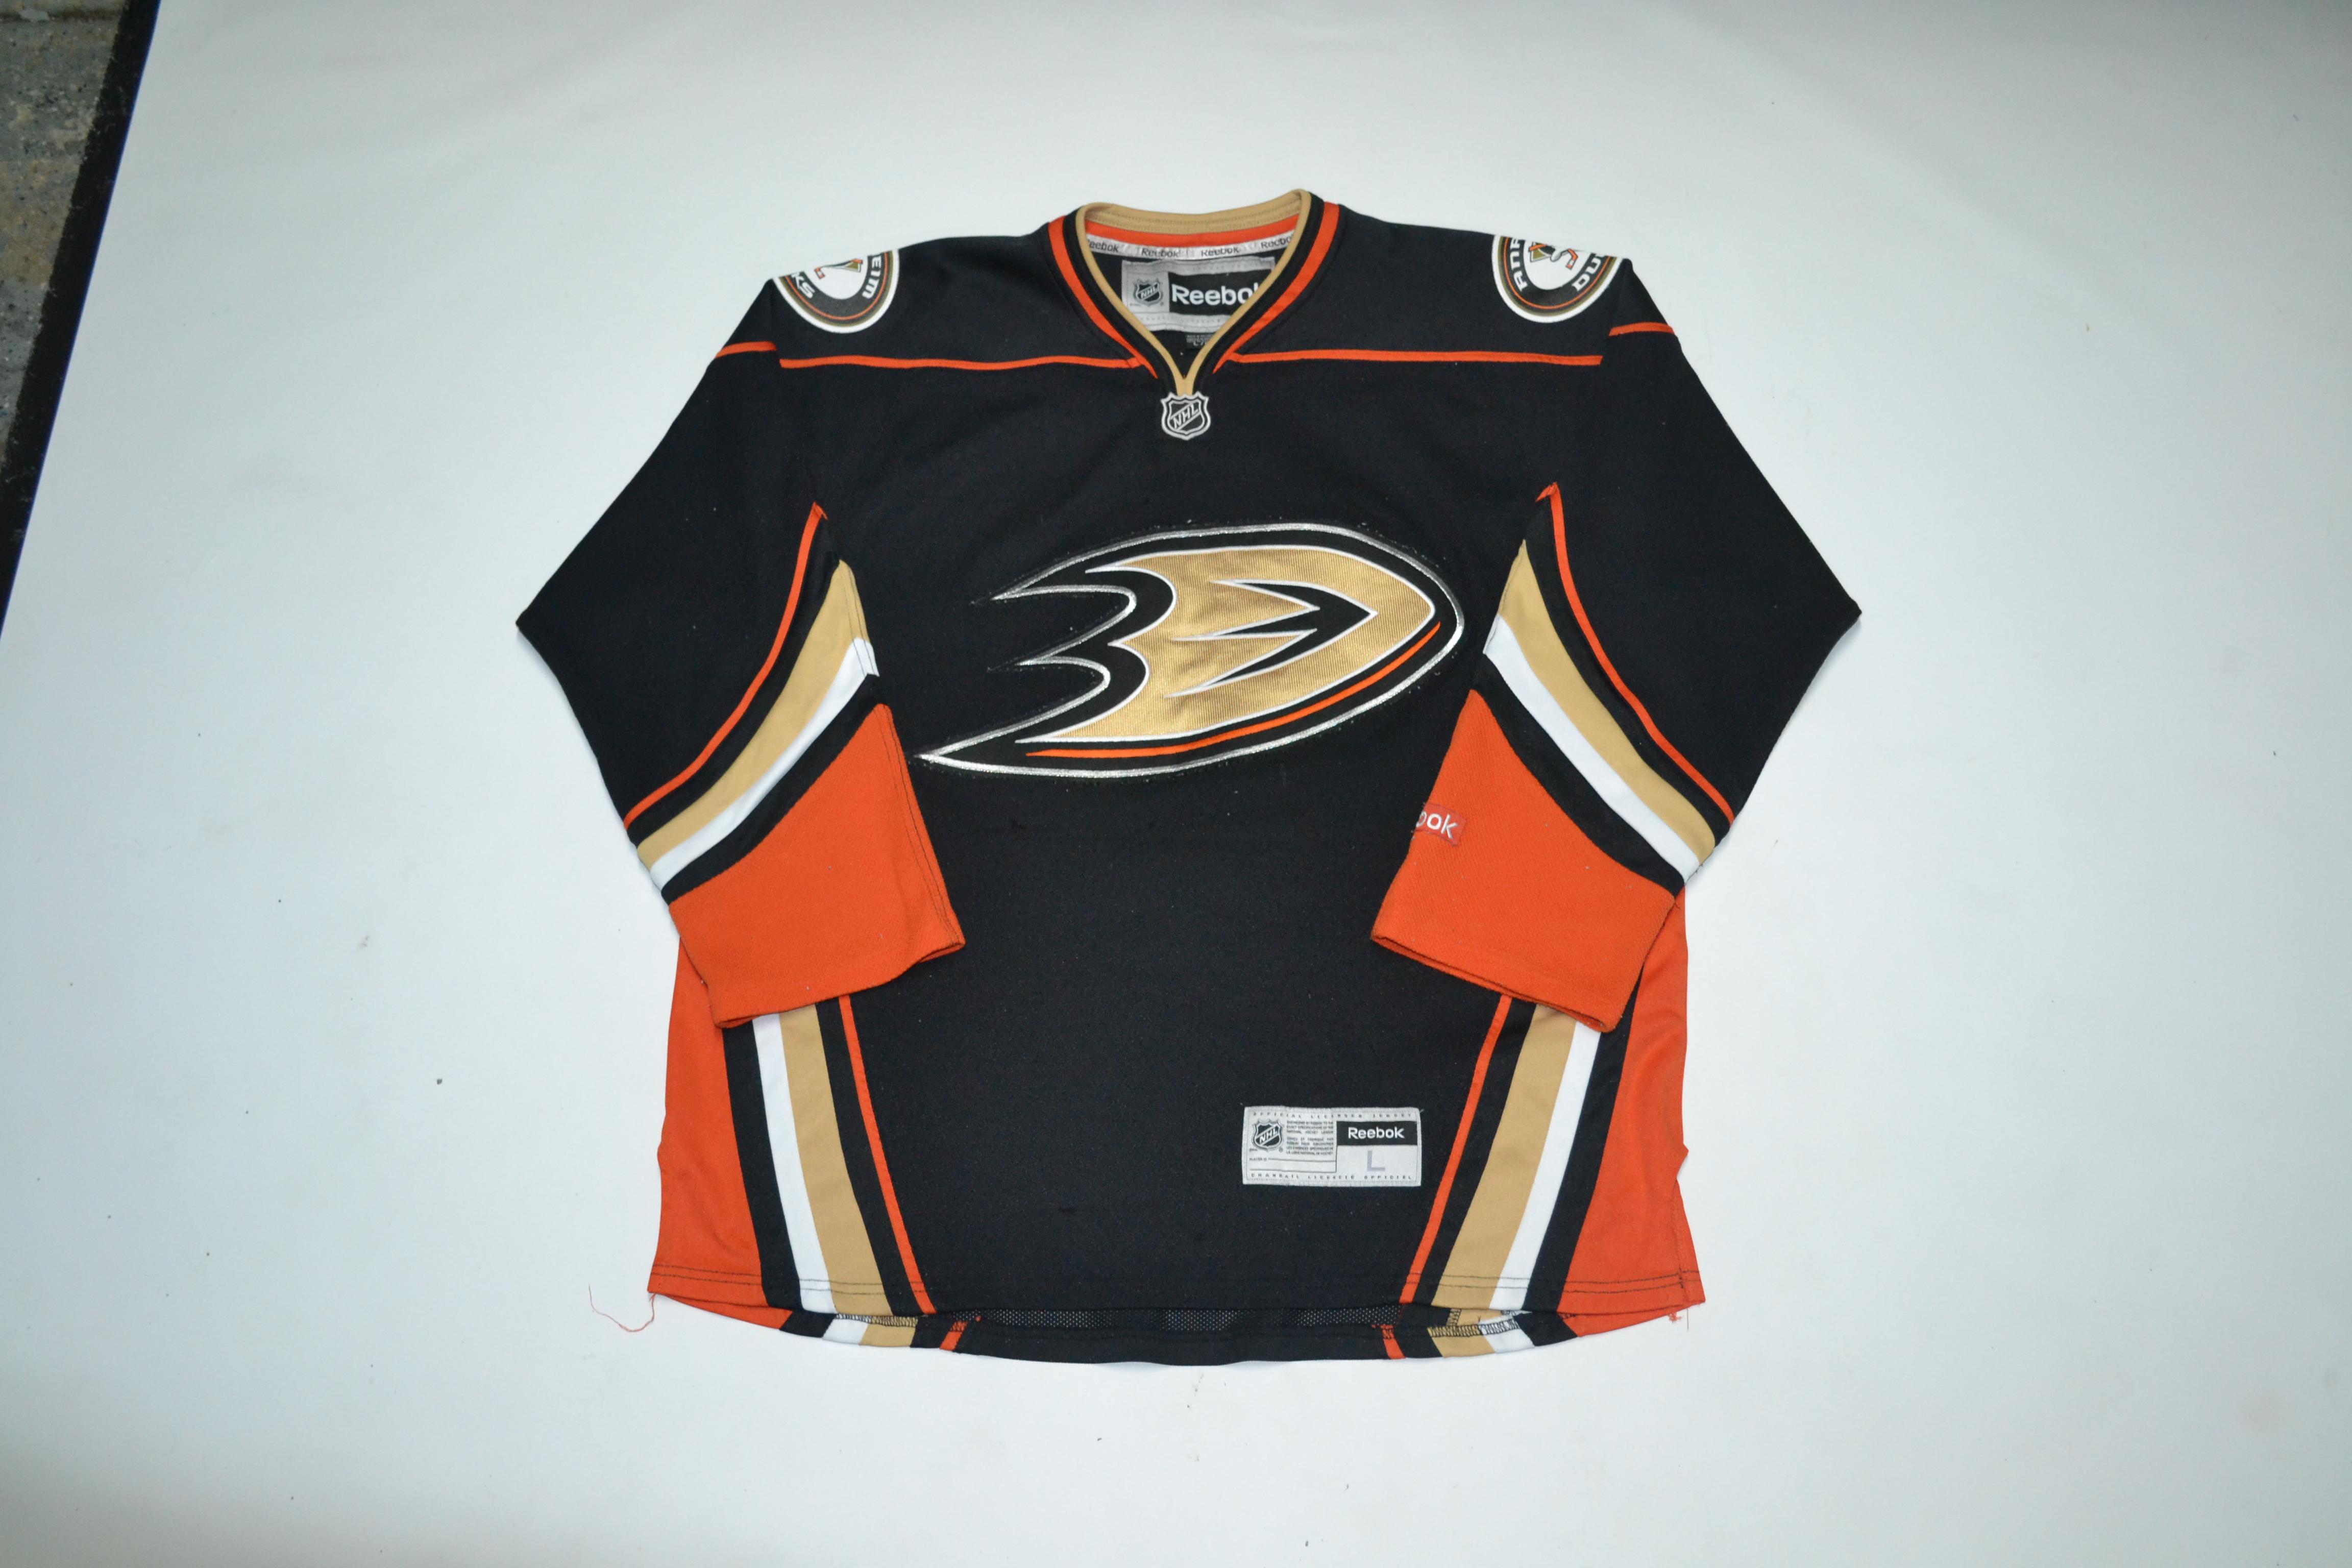 new styles d8150 944c1 VTG Anaheim Ducks Jersey NHL Hockey 80s 90s streetwear fashion hip hop  Mighty